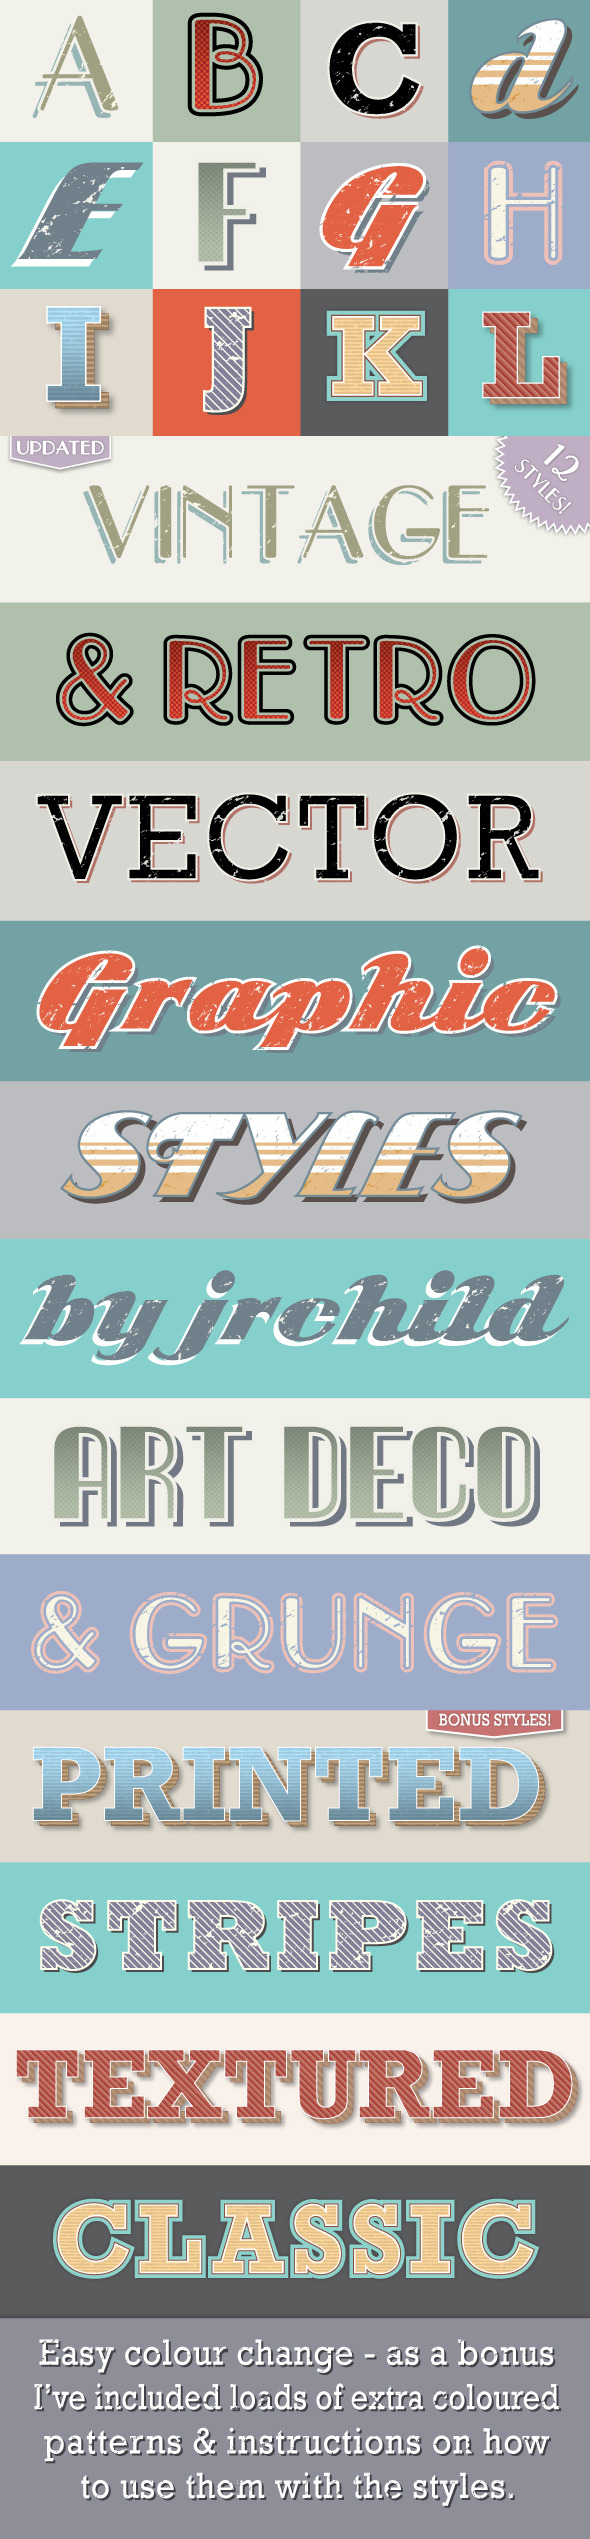 Vintage & Retro Text Styles - Styles Illustrator